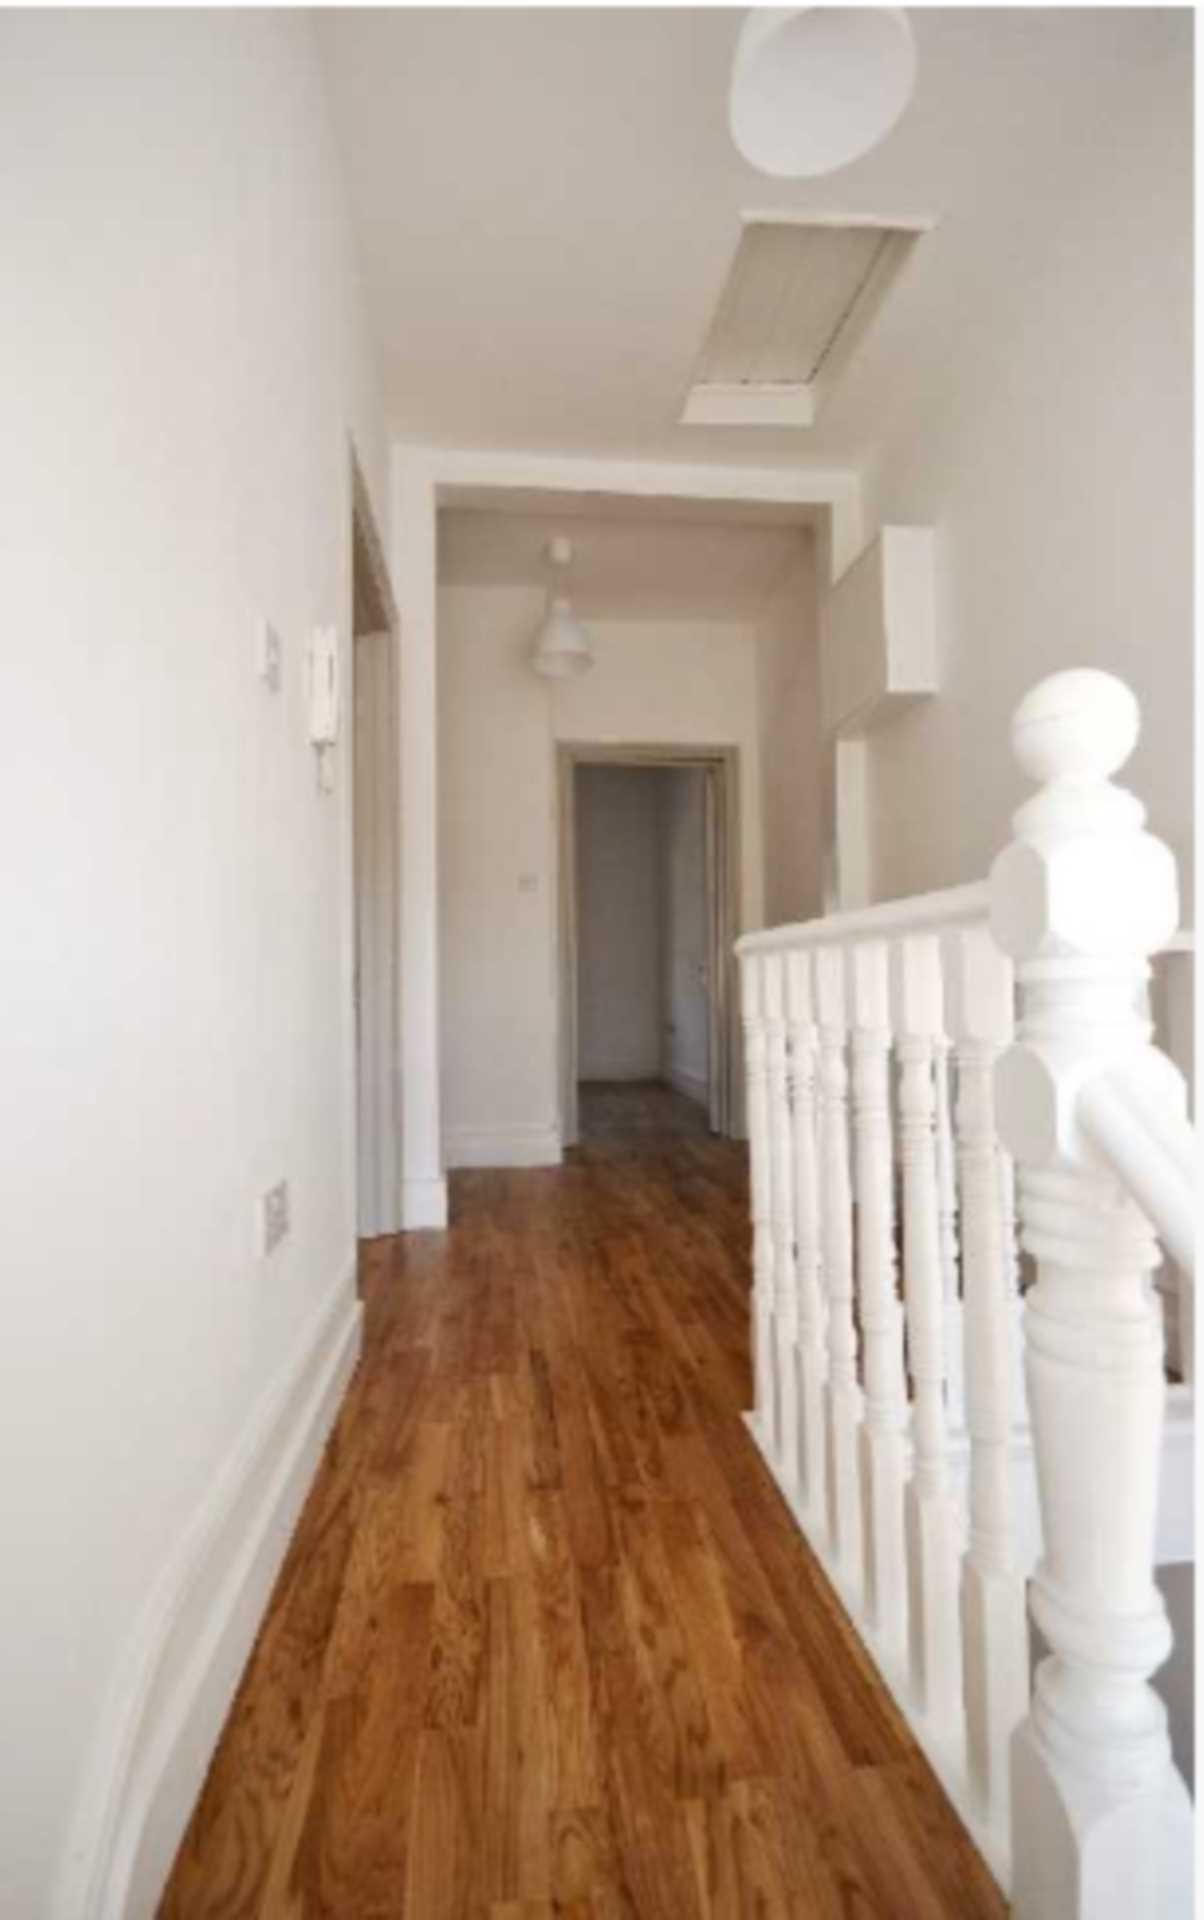 4 bedroom flat to rent, Uxbridge Road, London, W12 9RA